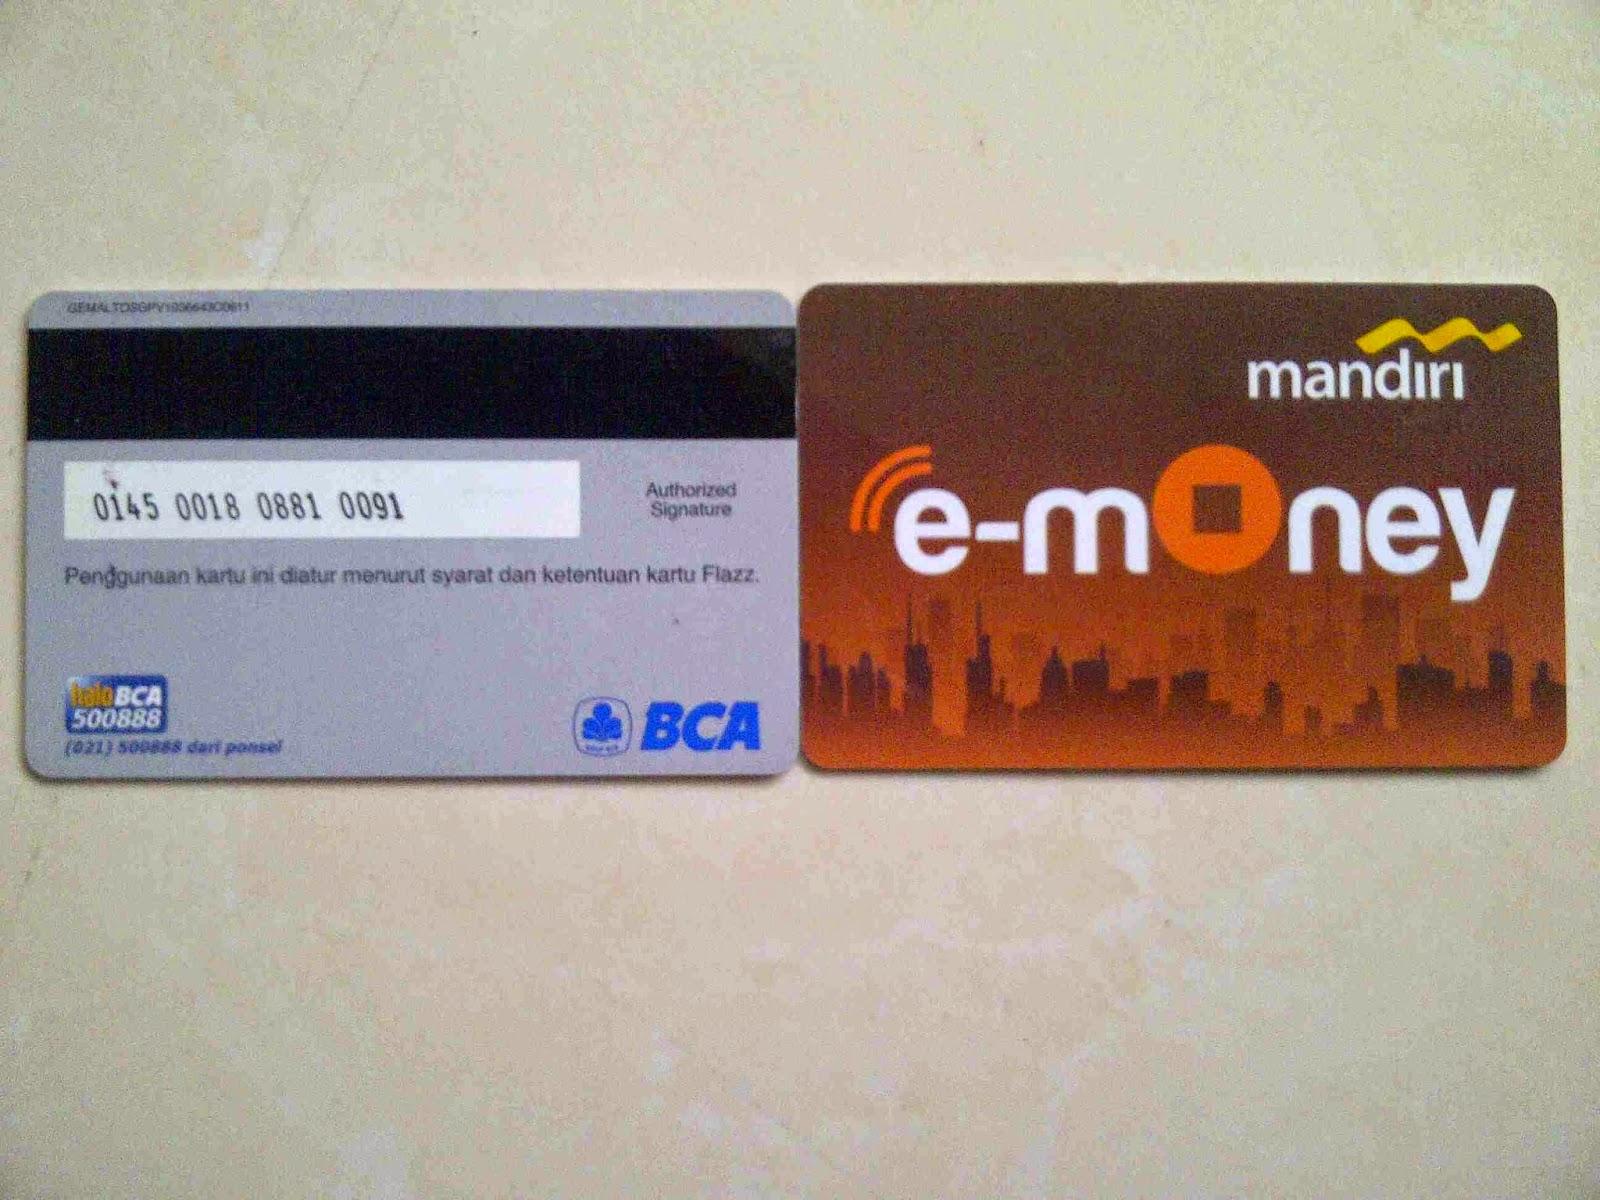 Tanpa Kategori Laman 3 Bisnisonesystem Flazz Card Bca 10 Kartu Prabayar Yang Dimiliki Penulis